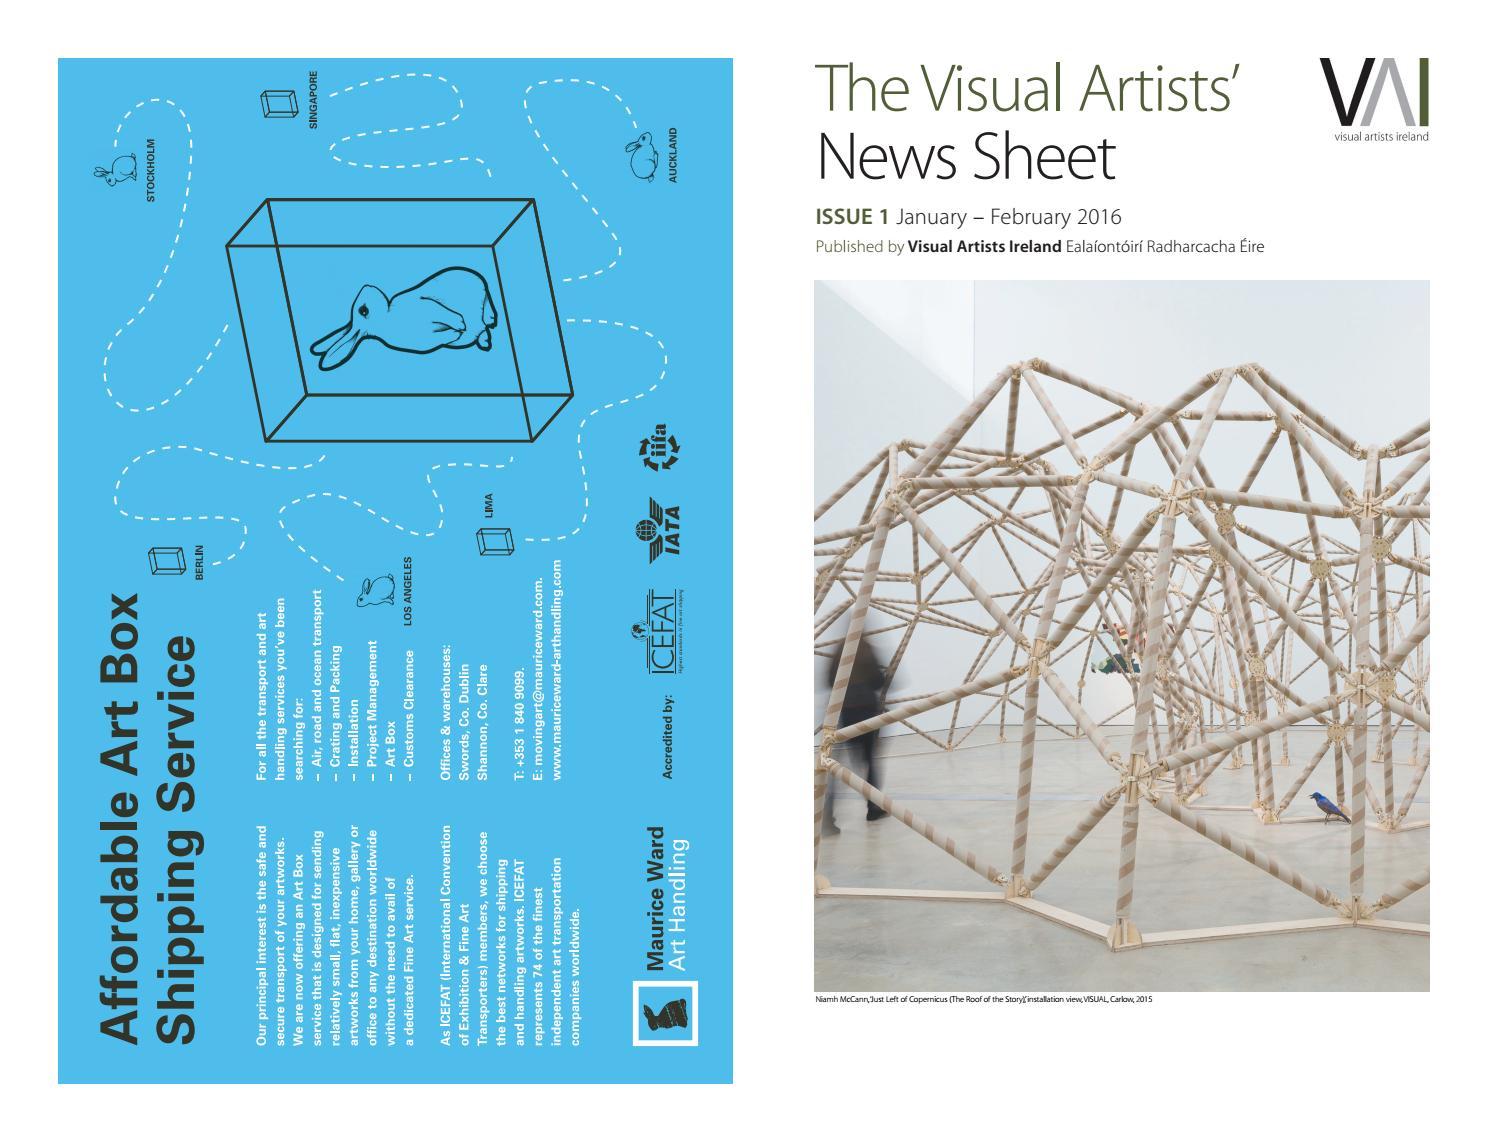 Visual artists news sheet 2016 january february by visual artists news sheet 2016 january february by visualartistsireland issuu malvernweather Choice Image